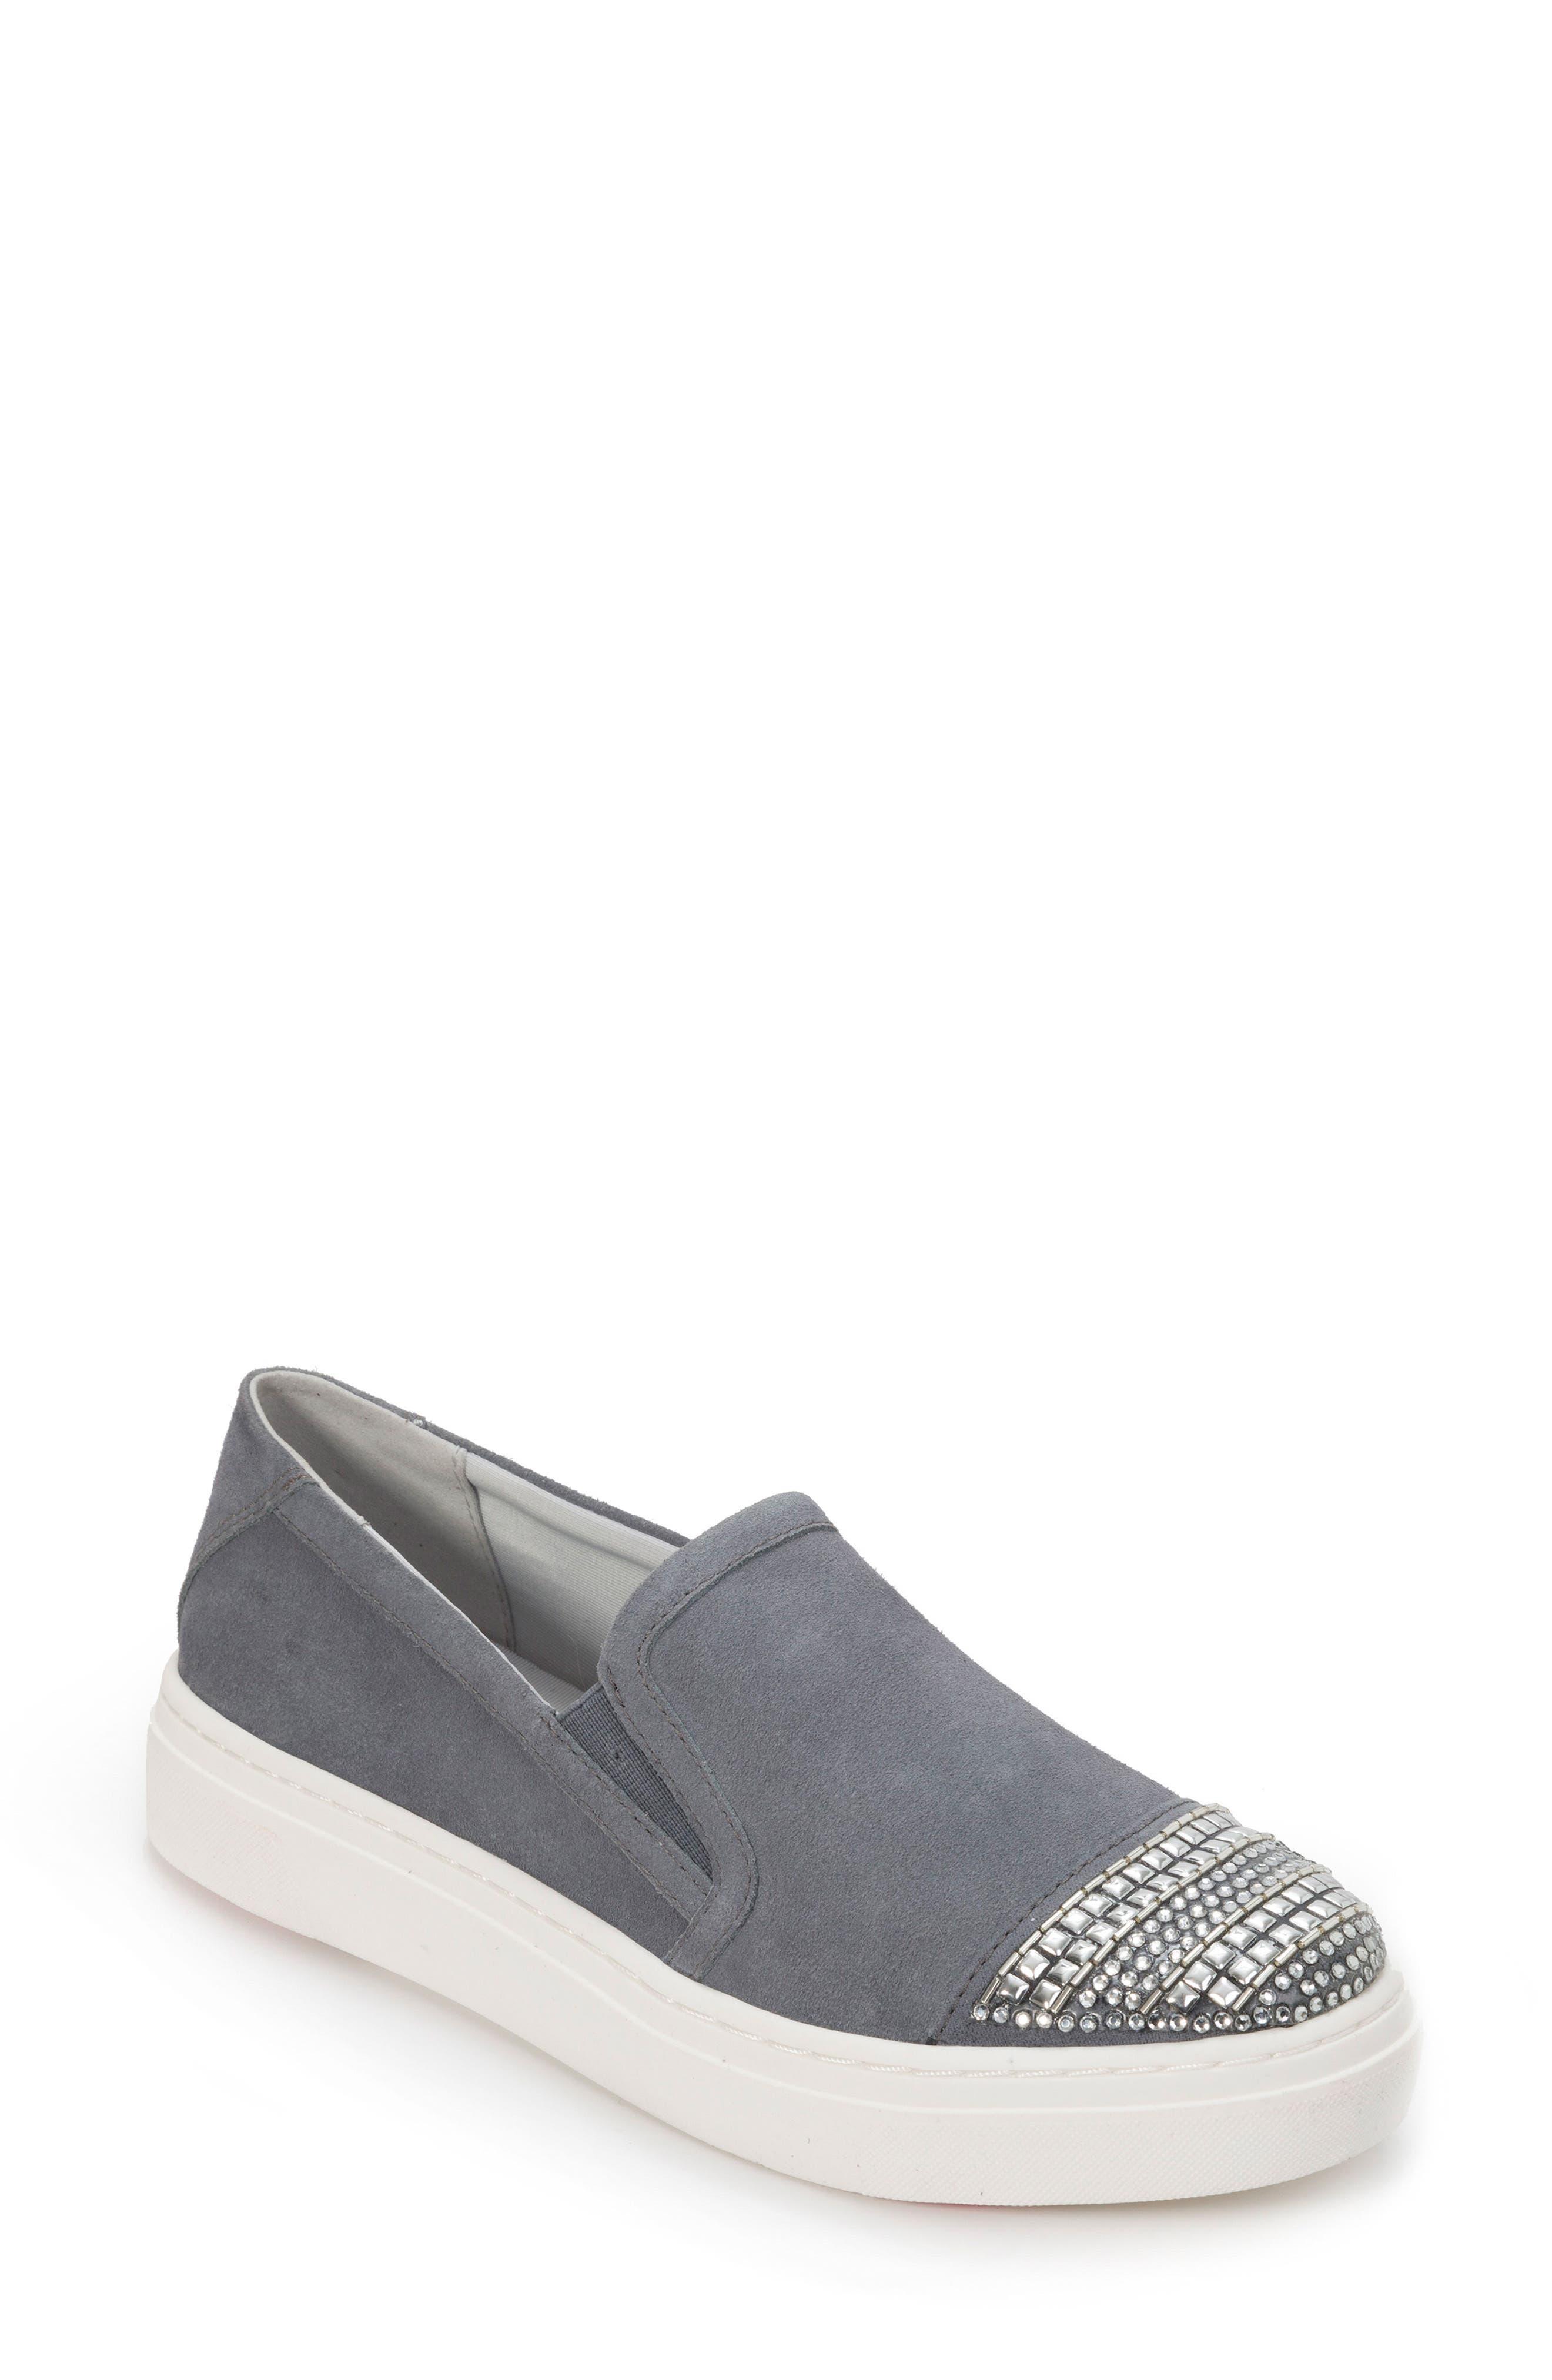 Finley Slip-On Sneaker,                             Main thumbnail 1, color,                             DENIM BLUE SUEDE